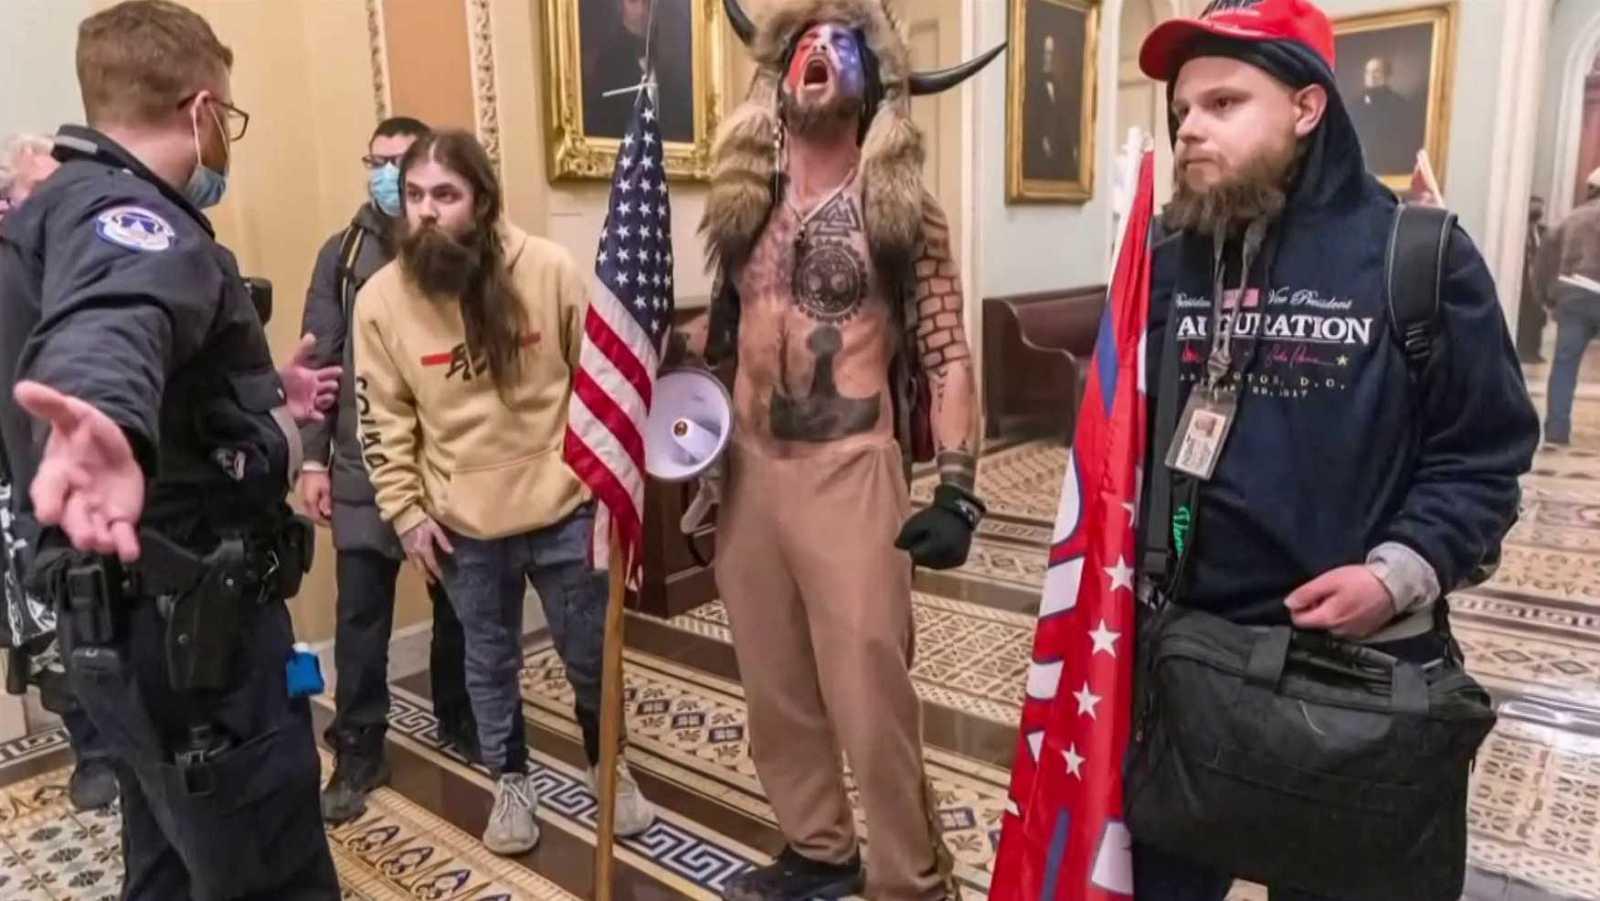 'USA. Presidentes, golpes y no golpes'